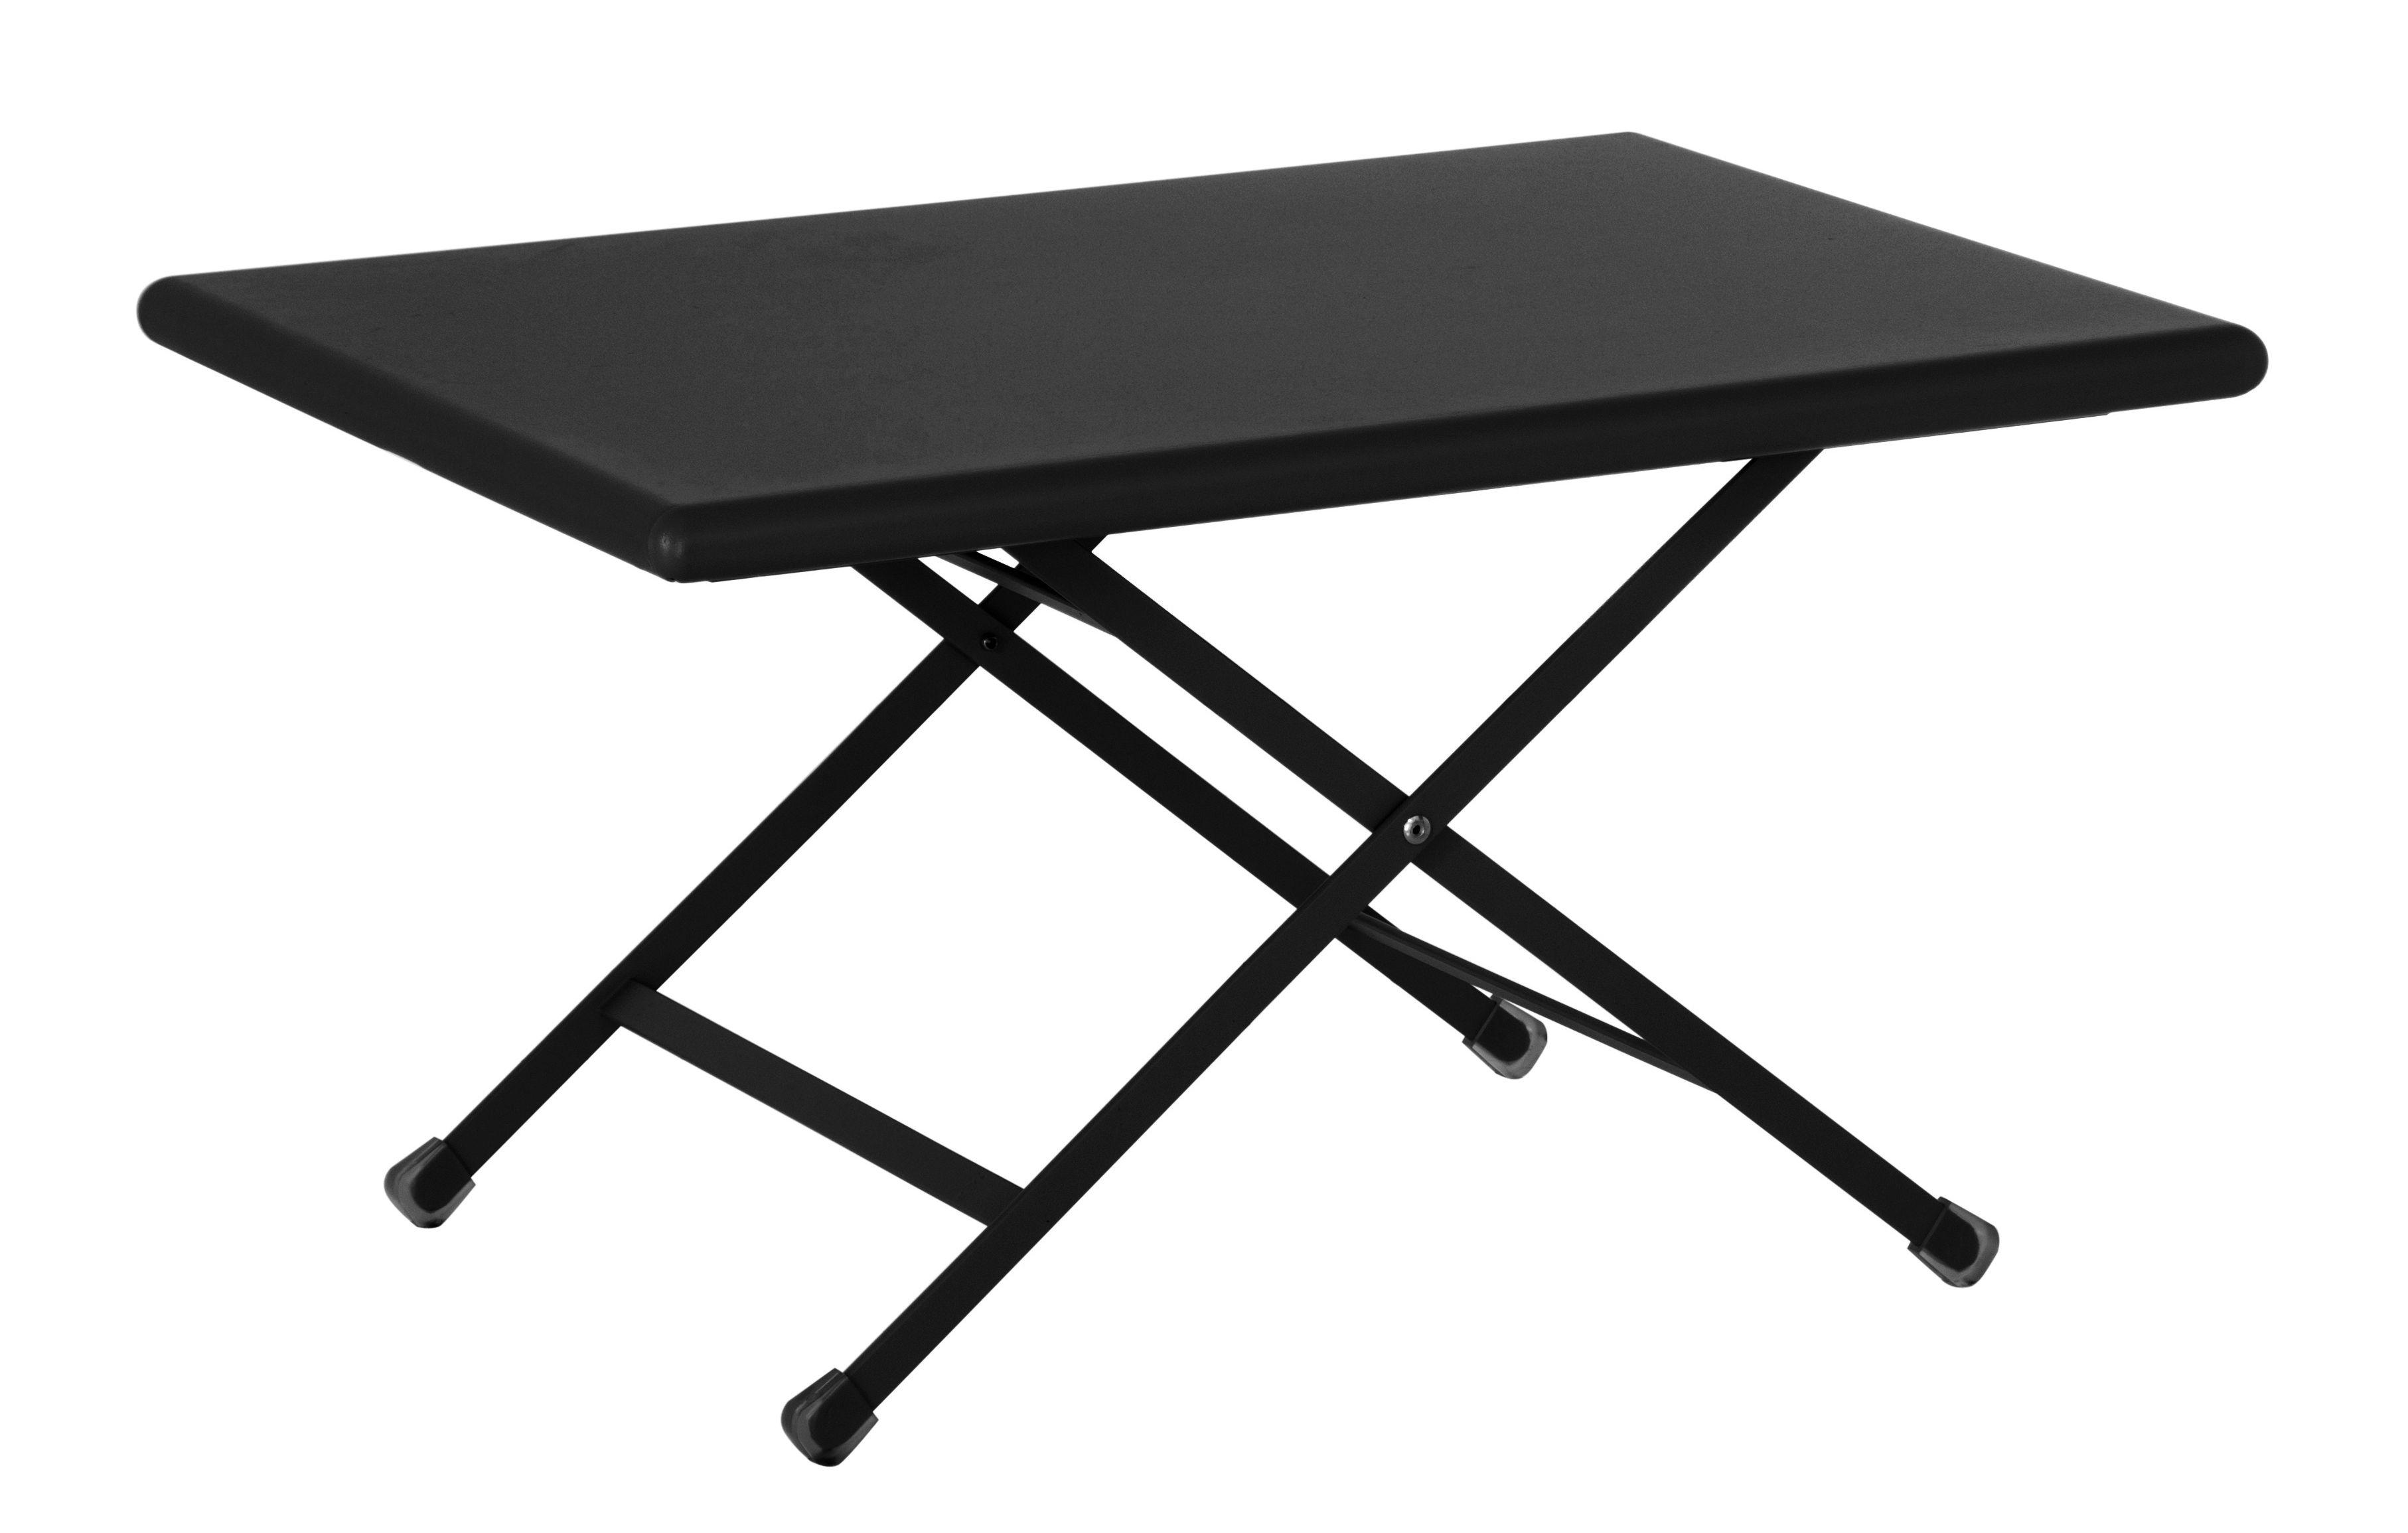 Cm Arc 50 70 En X Basse Ciel Table Pliante Emu kwXiuOZTPl